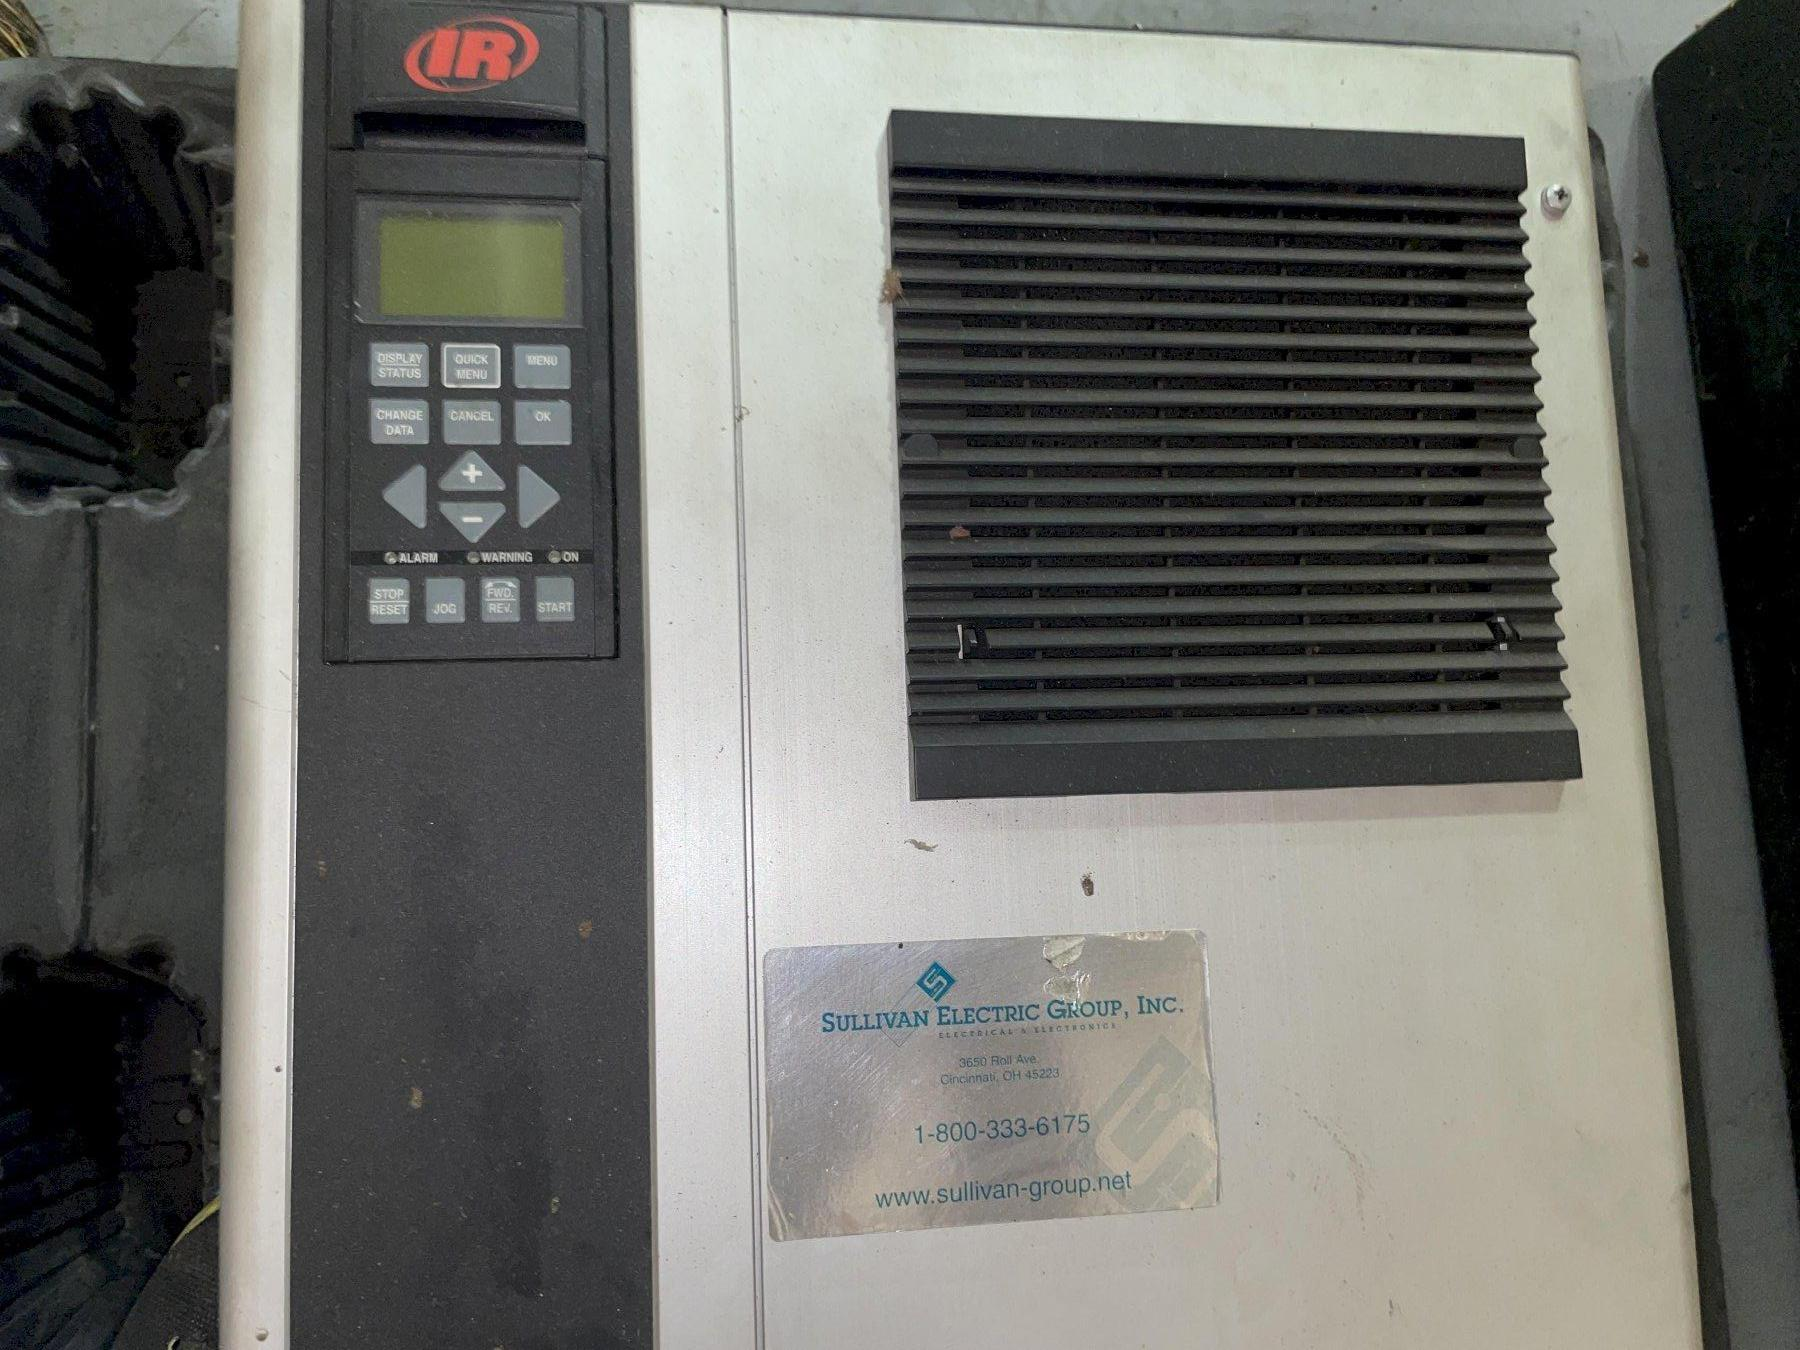 125 HP INGERSOLL RAND MODEL SSR-EP125 ROTARY SCREW AIR COMPRESSOR W/ IR SERVO DRIVE: STOCK #15458